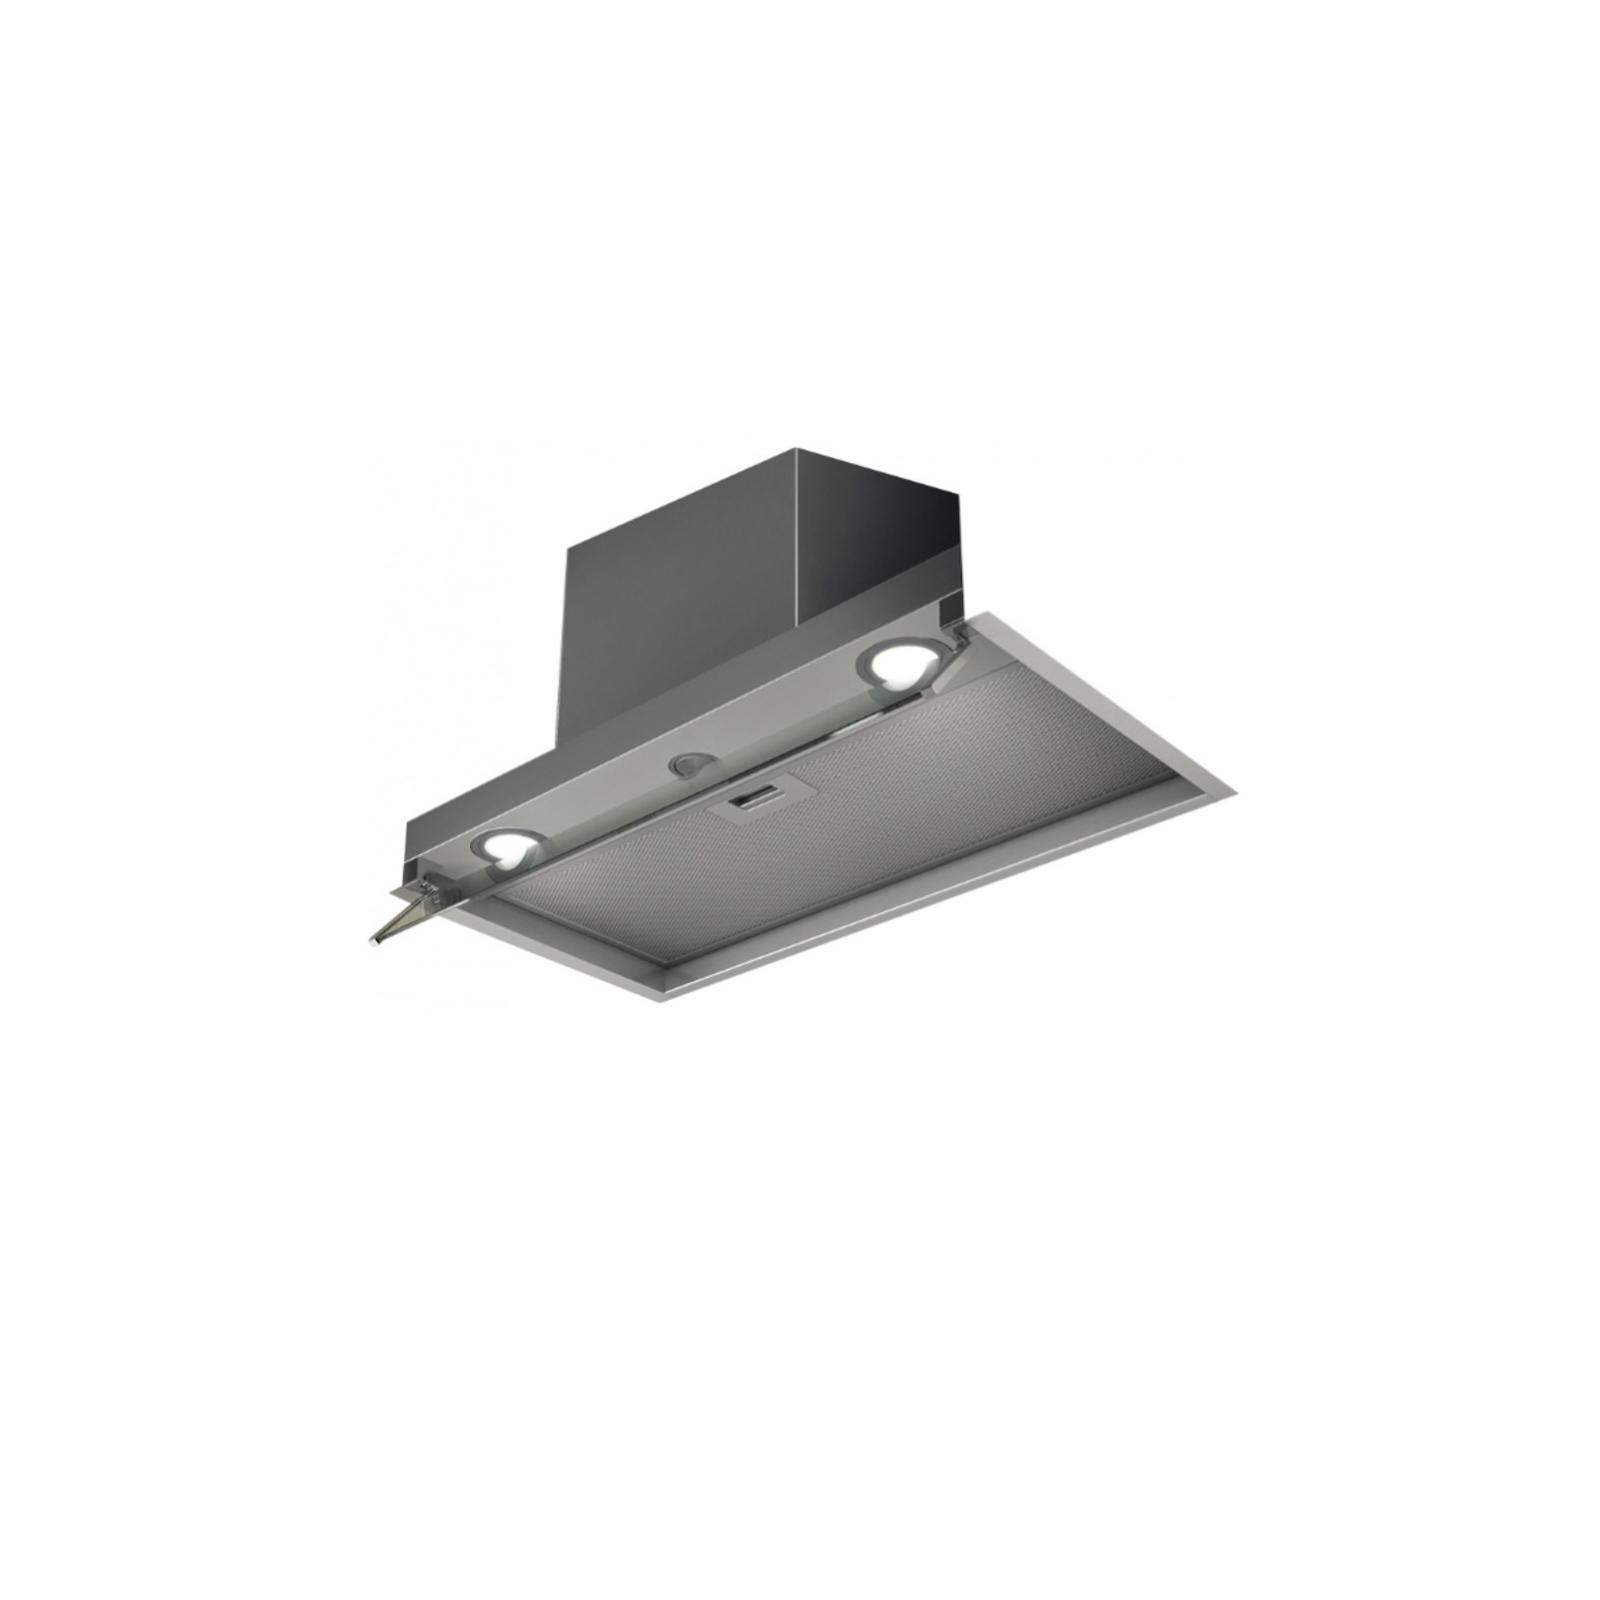 Вытяжка кухонная Elica BOX IN PLUS IXGL/A/60